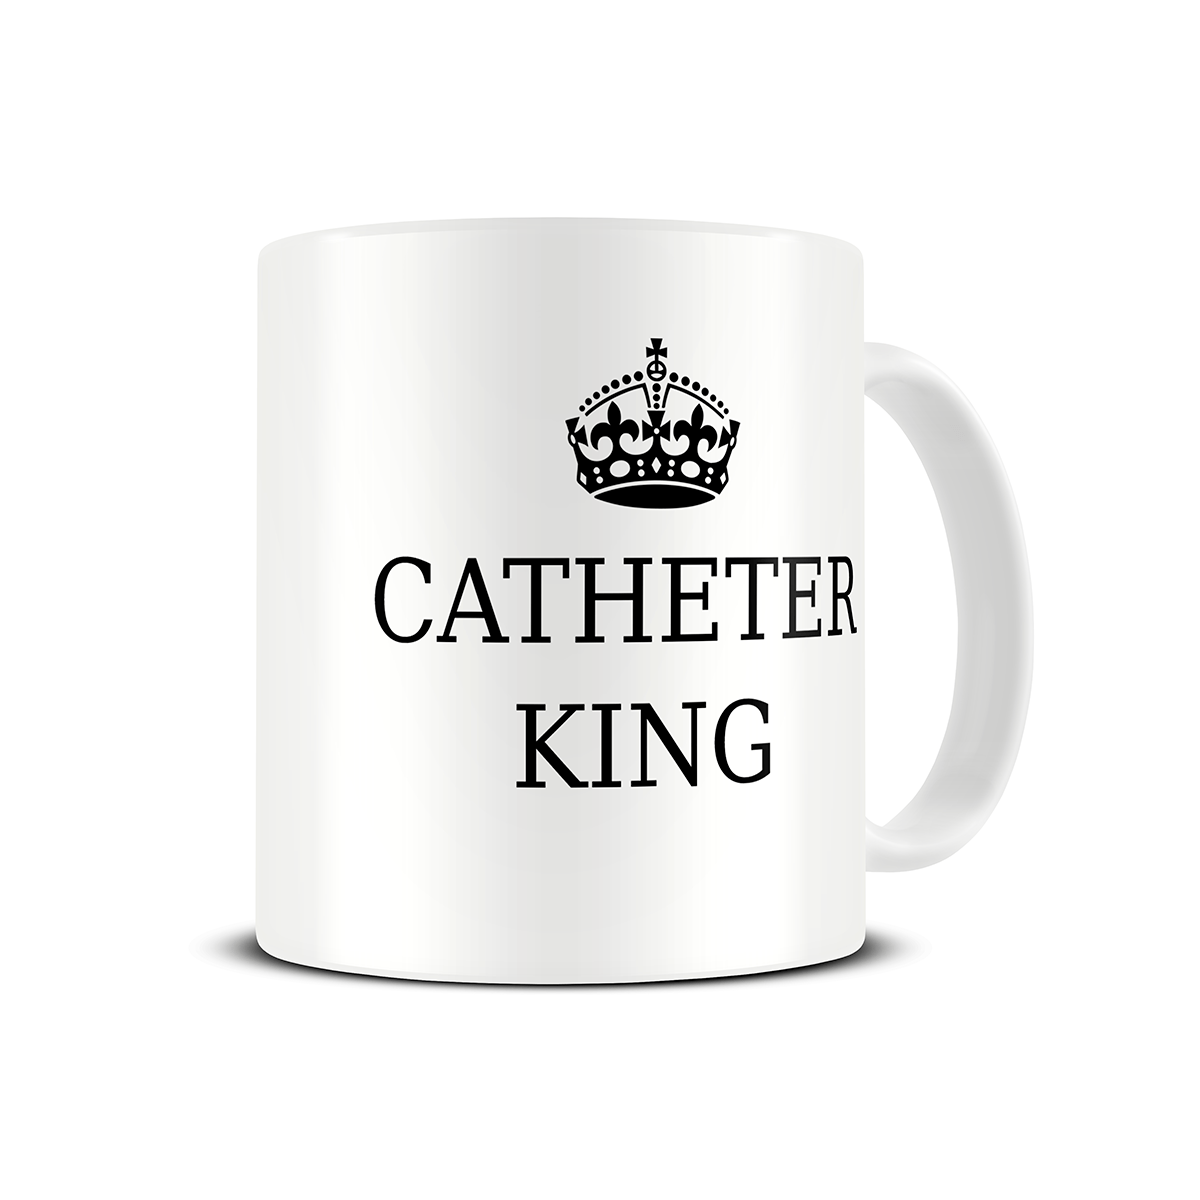 nurse-gift-mug-catheter-king